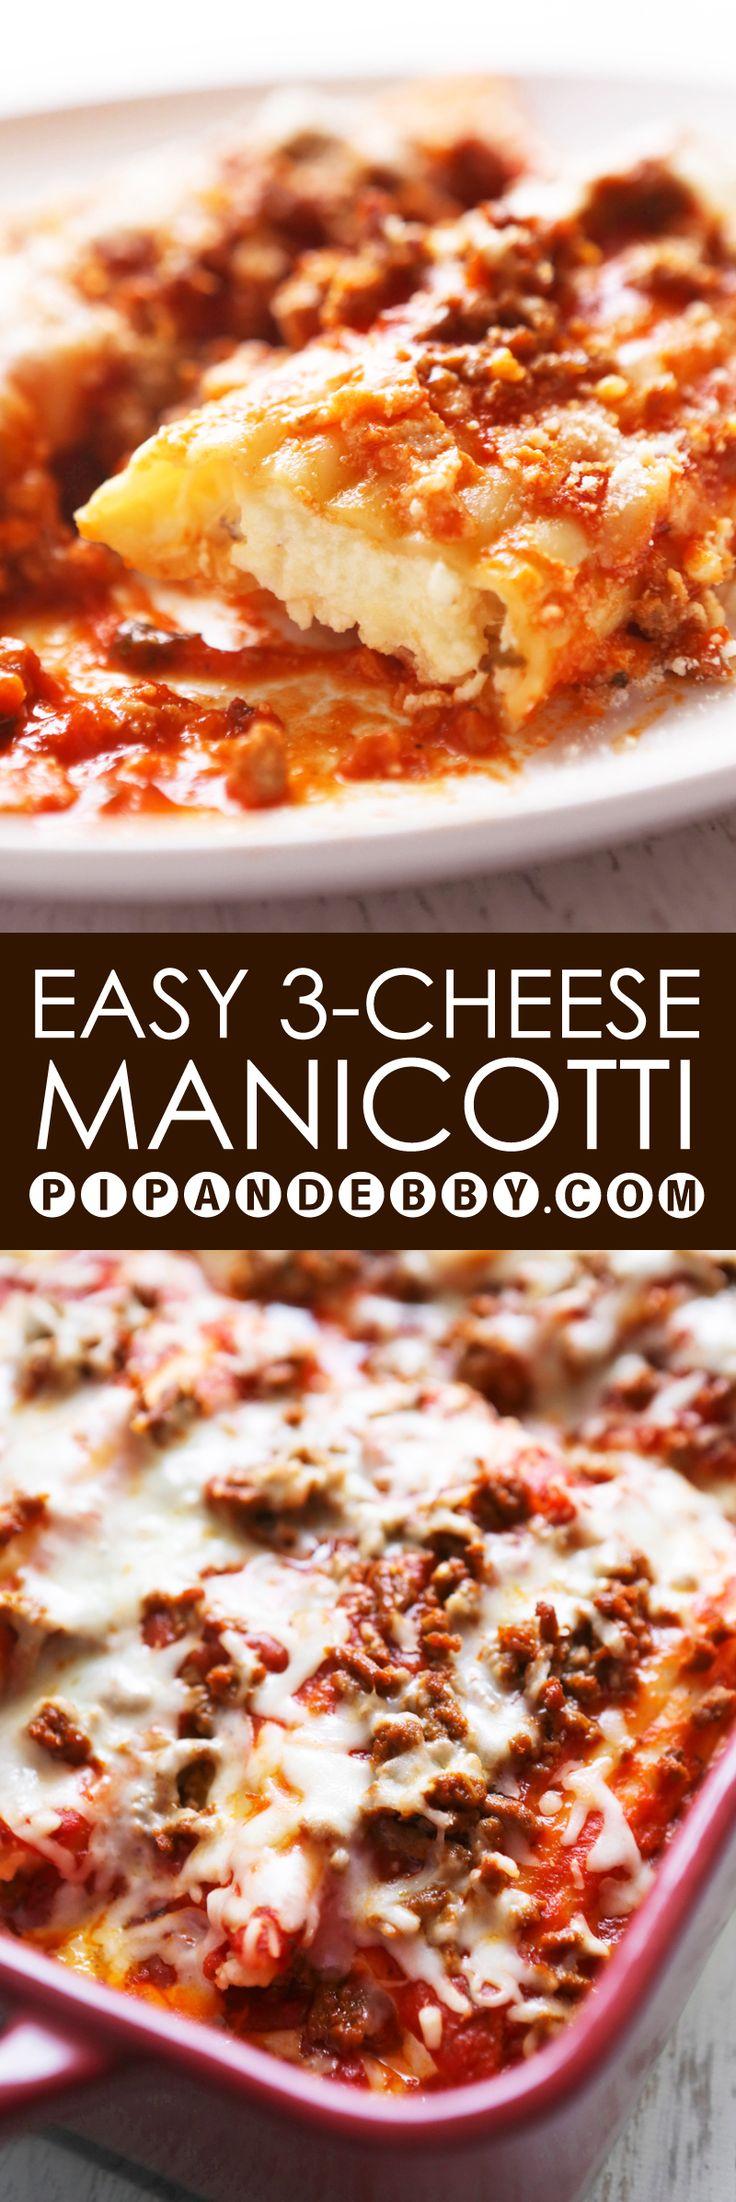 Easy Three-Cheese Manicotti   Three gooey cheeses in this EASY pasta dinner!